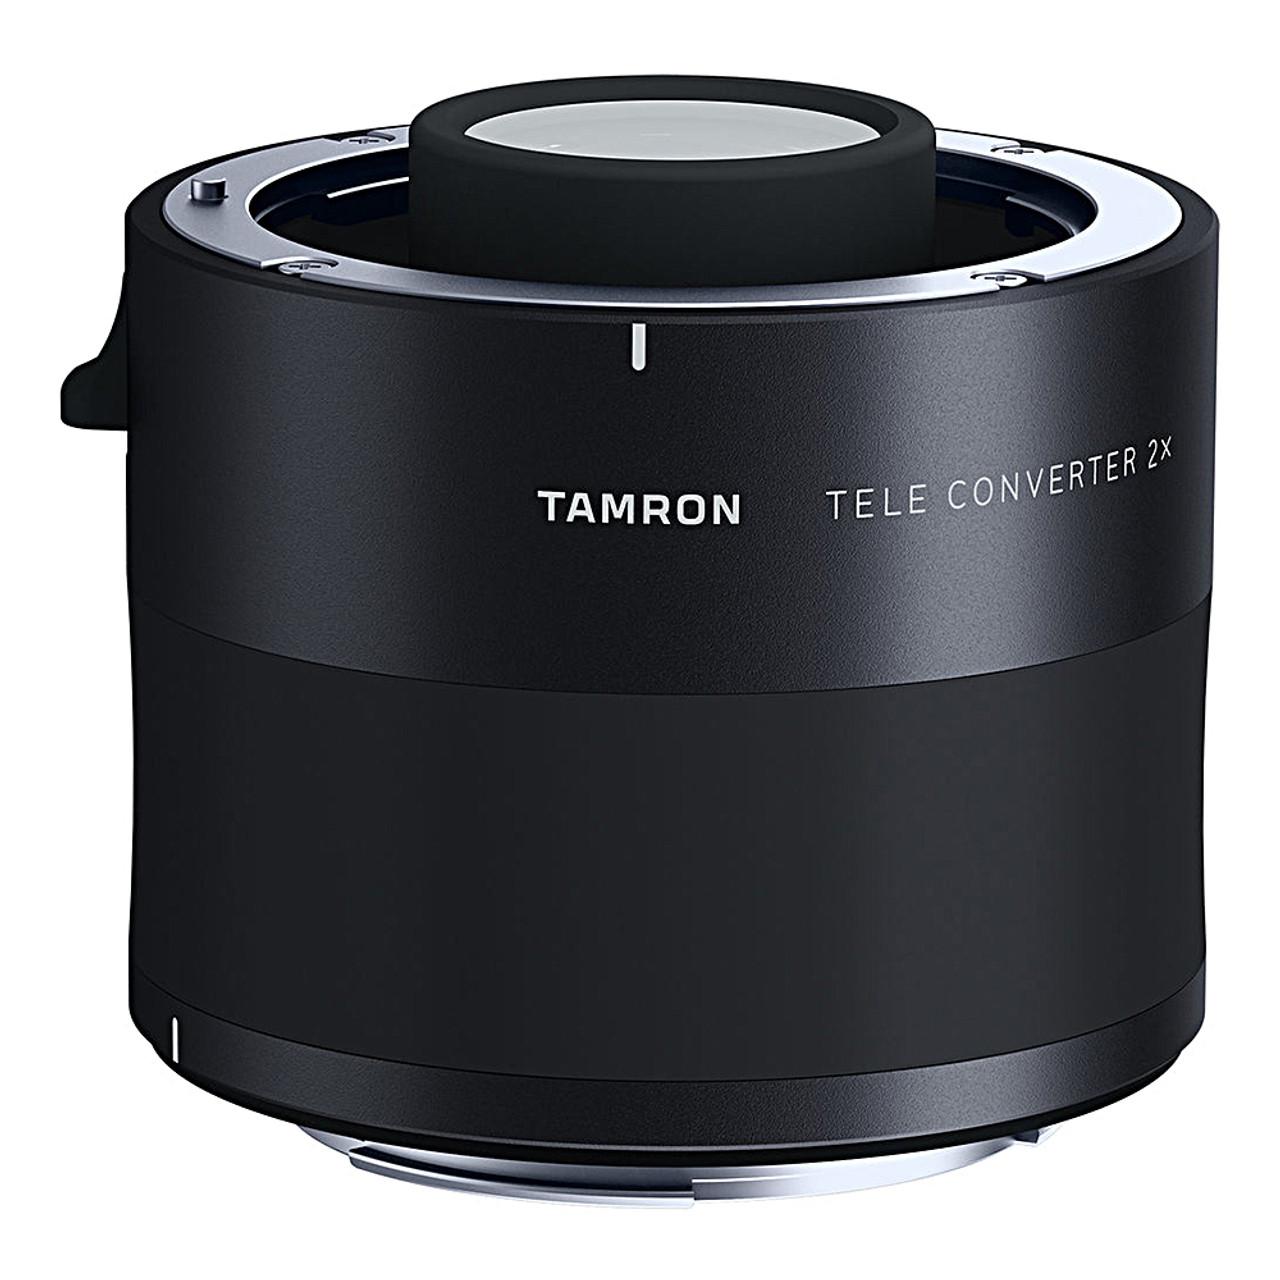 TAMRON TC-X20 2X TELECONVERTER (CANON)